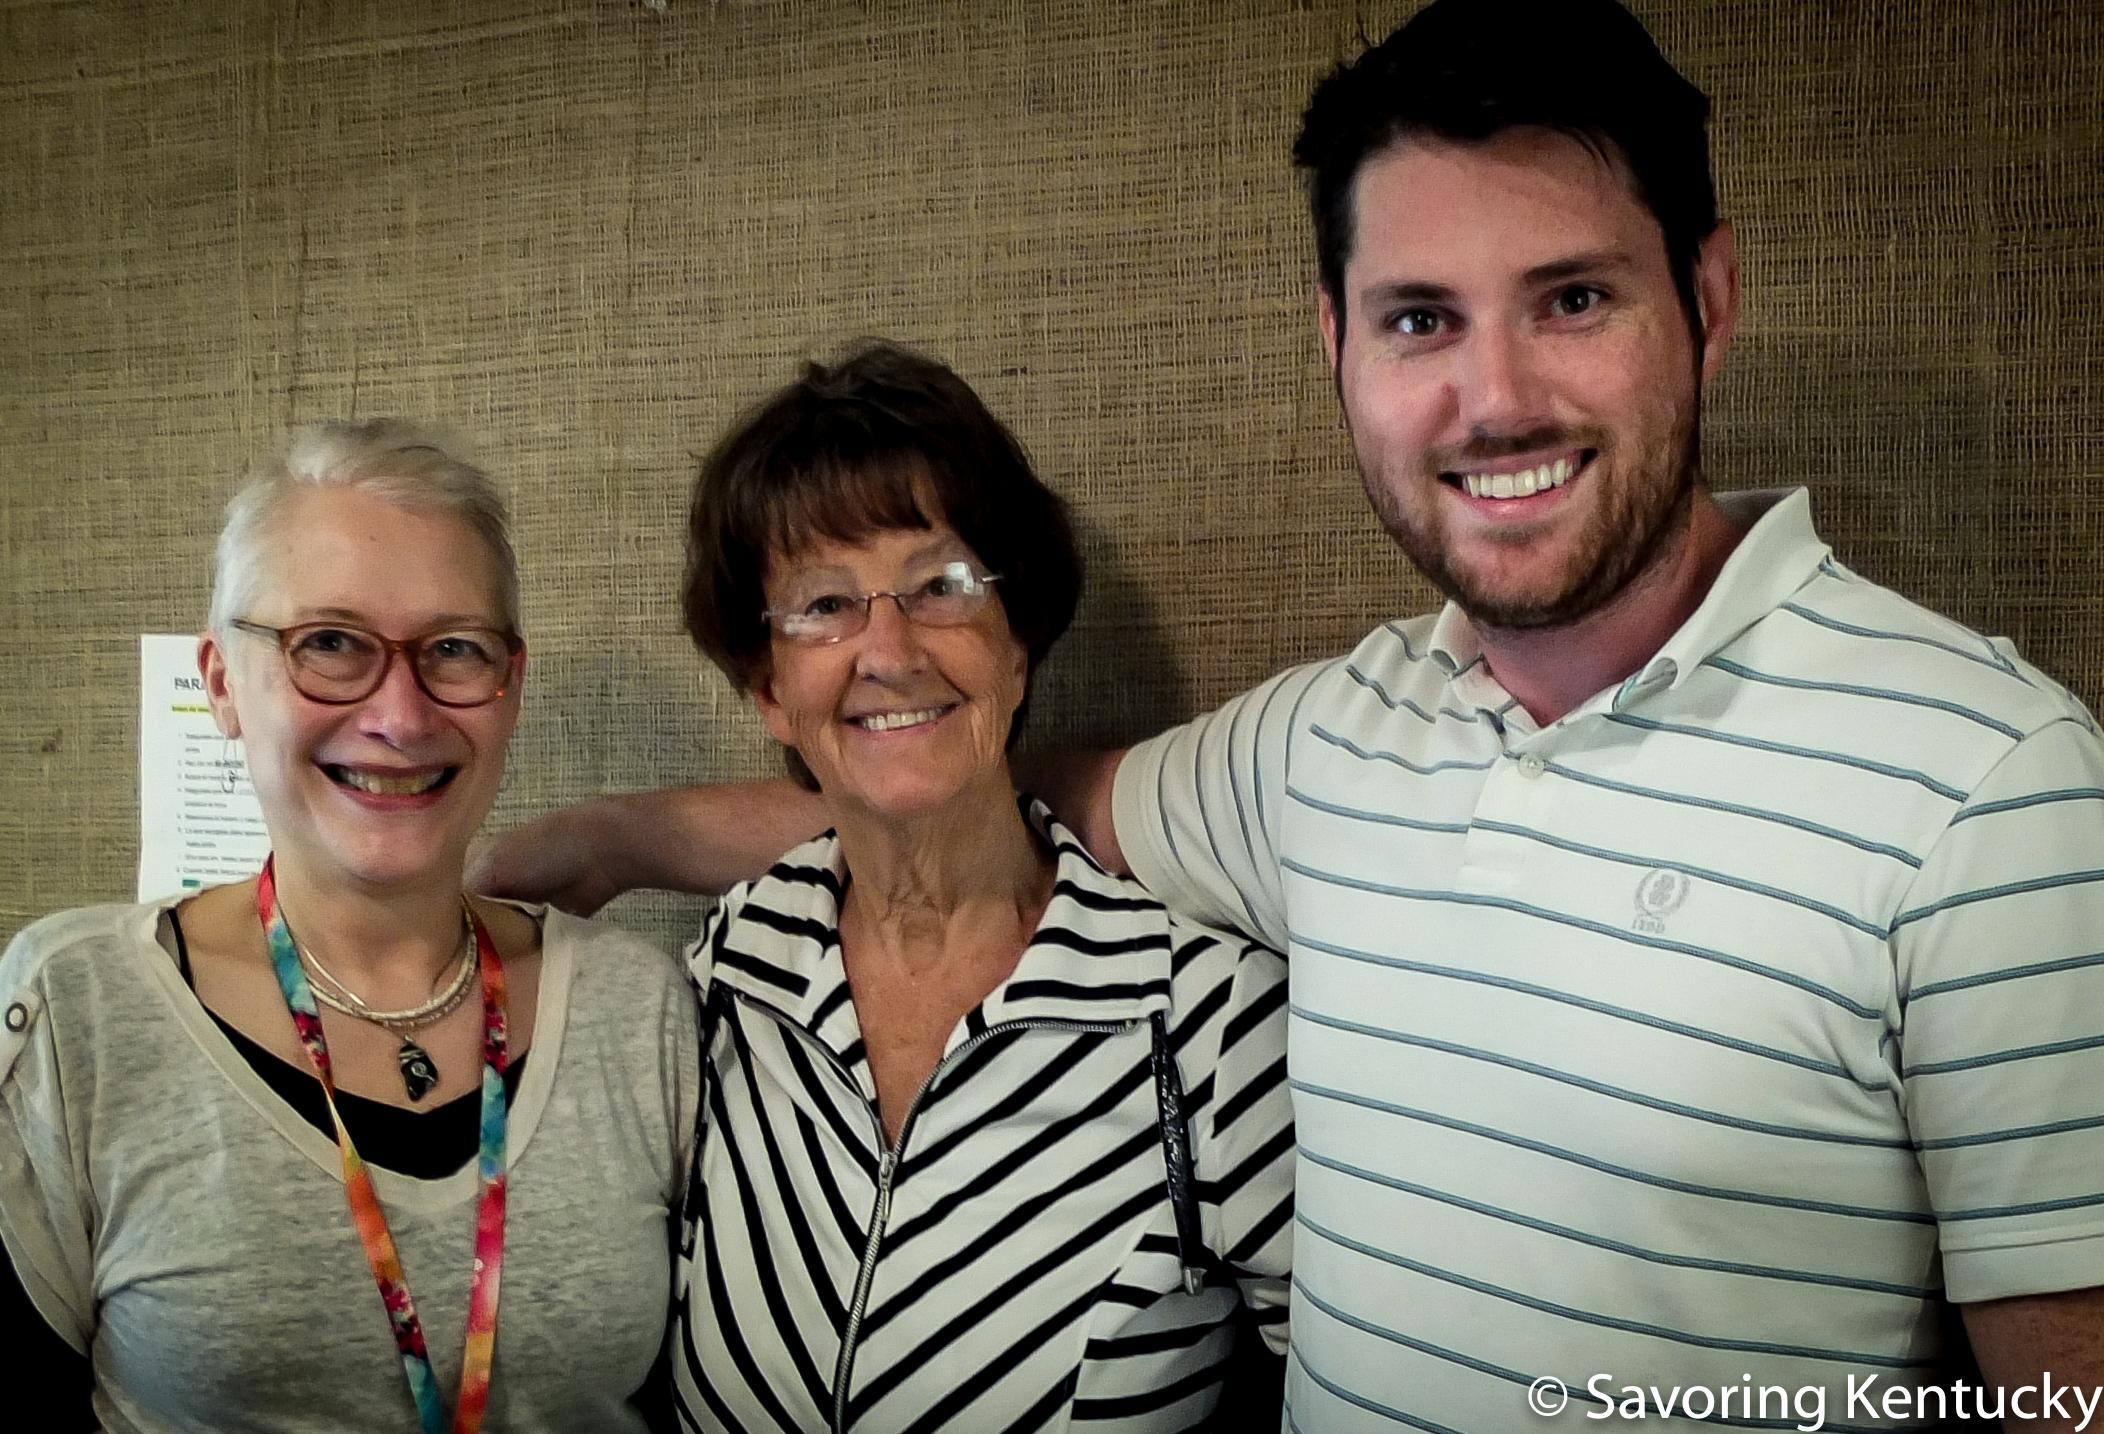 From left: Hot Water Cornbread host Rona Roberts, Former Mayor and Lexington Farmers Market founder Pam Miller, Lexington Farmers Market manager Josh England